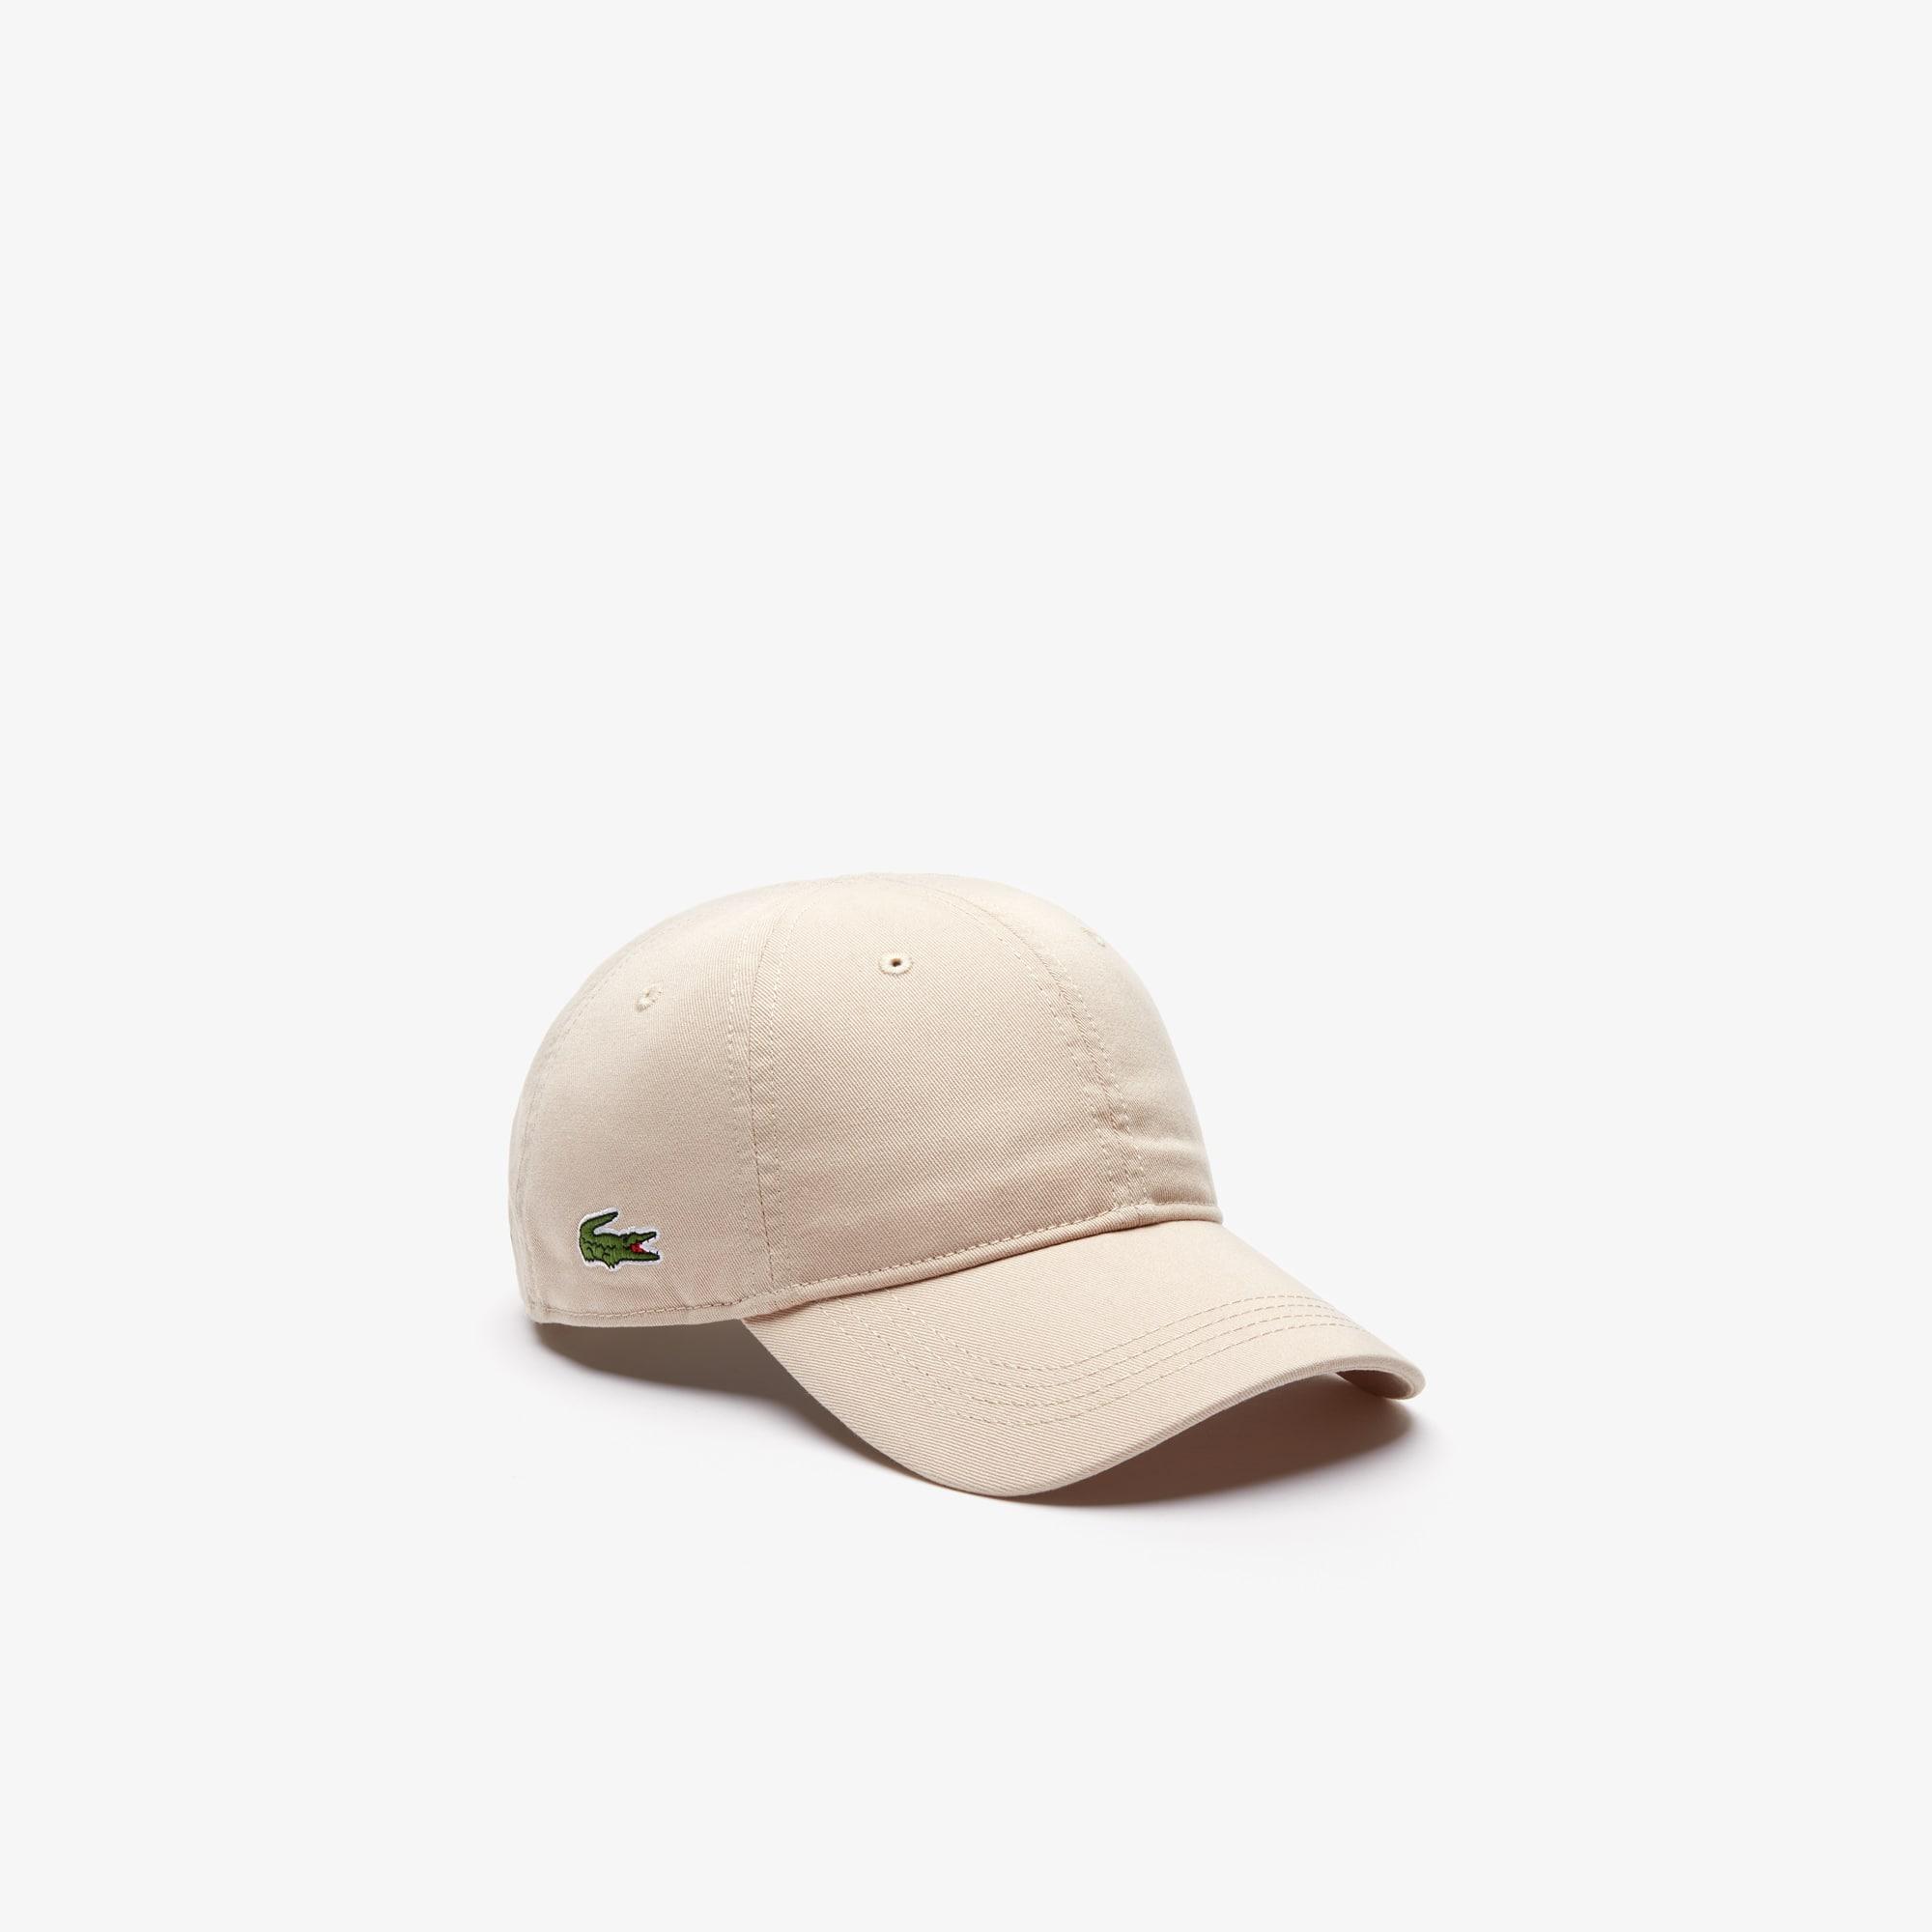 Bonés e Chapéus   Acessórios para Homem   LACOSTE f83bb169fd